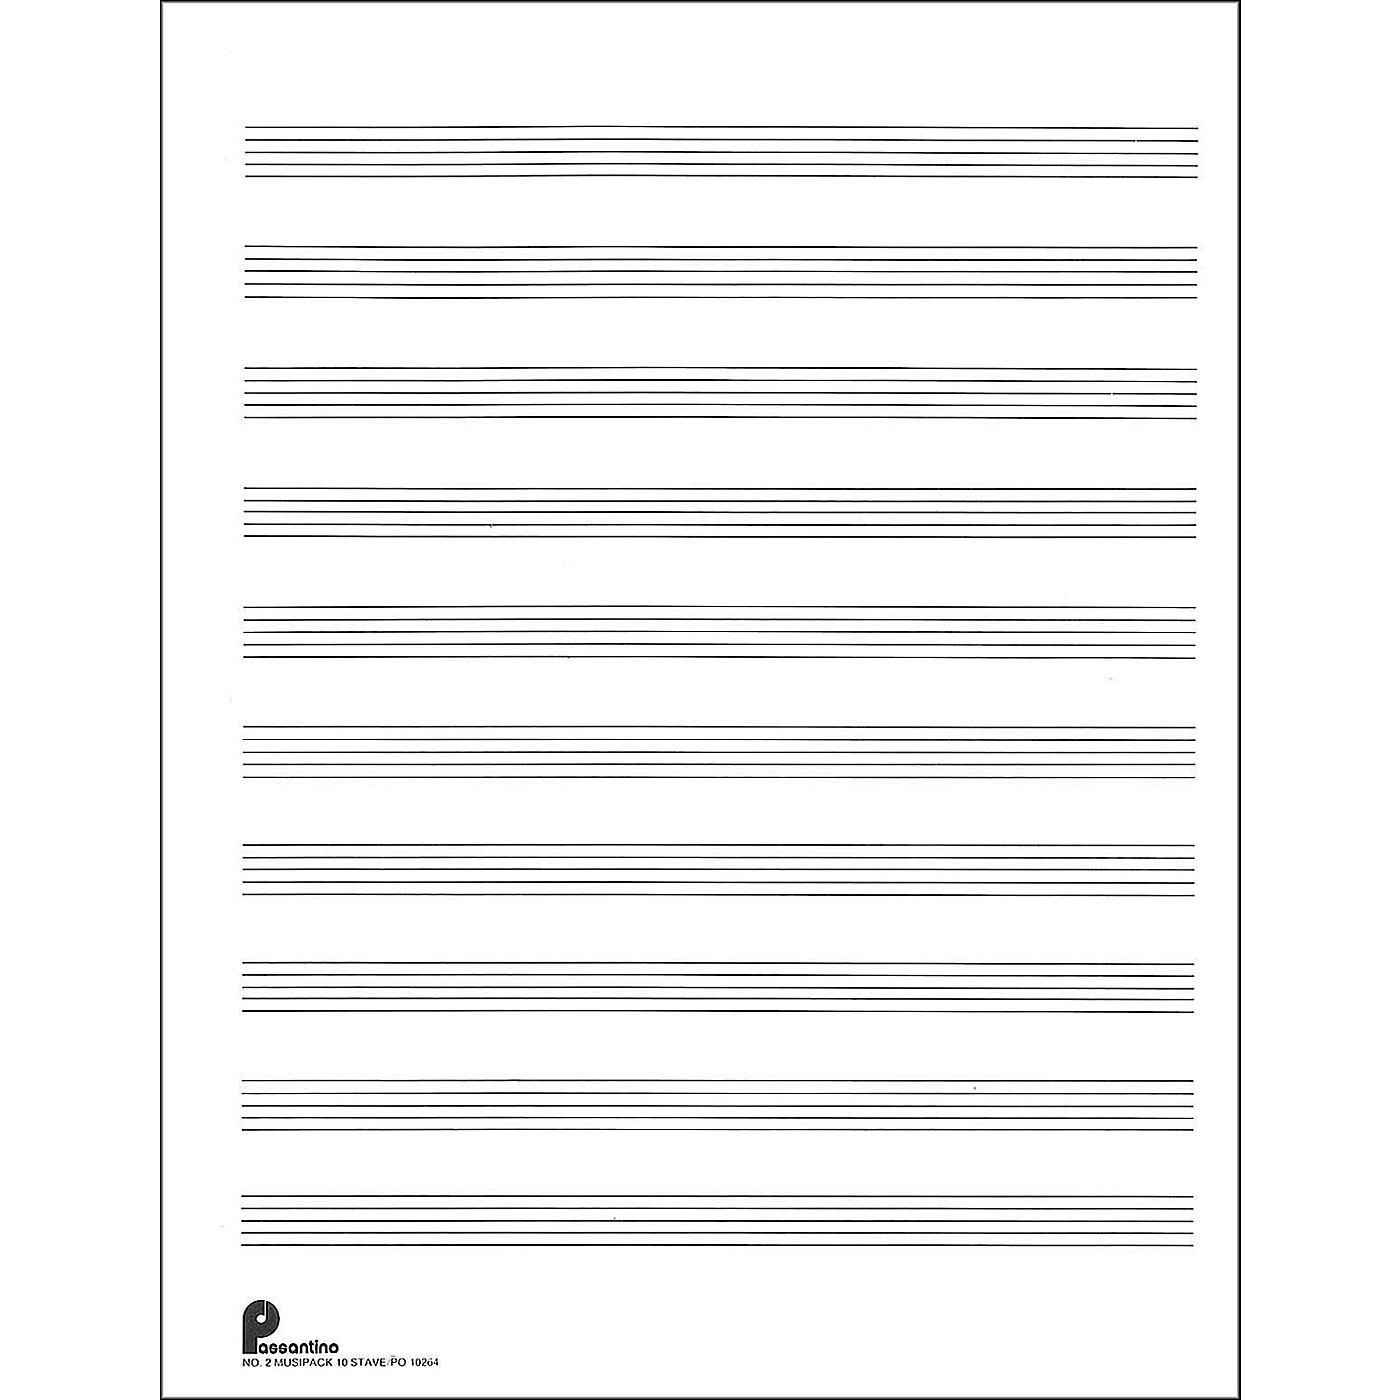 Music Sales Passantino Music Paper Filler No.2 96 Pages, 8.5X11, 3 Ring thumbnail